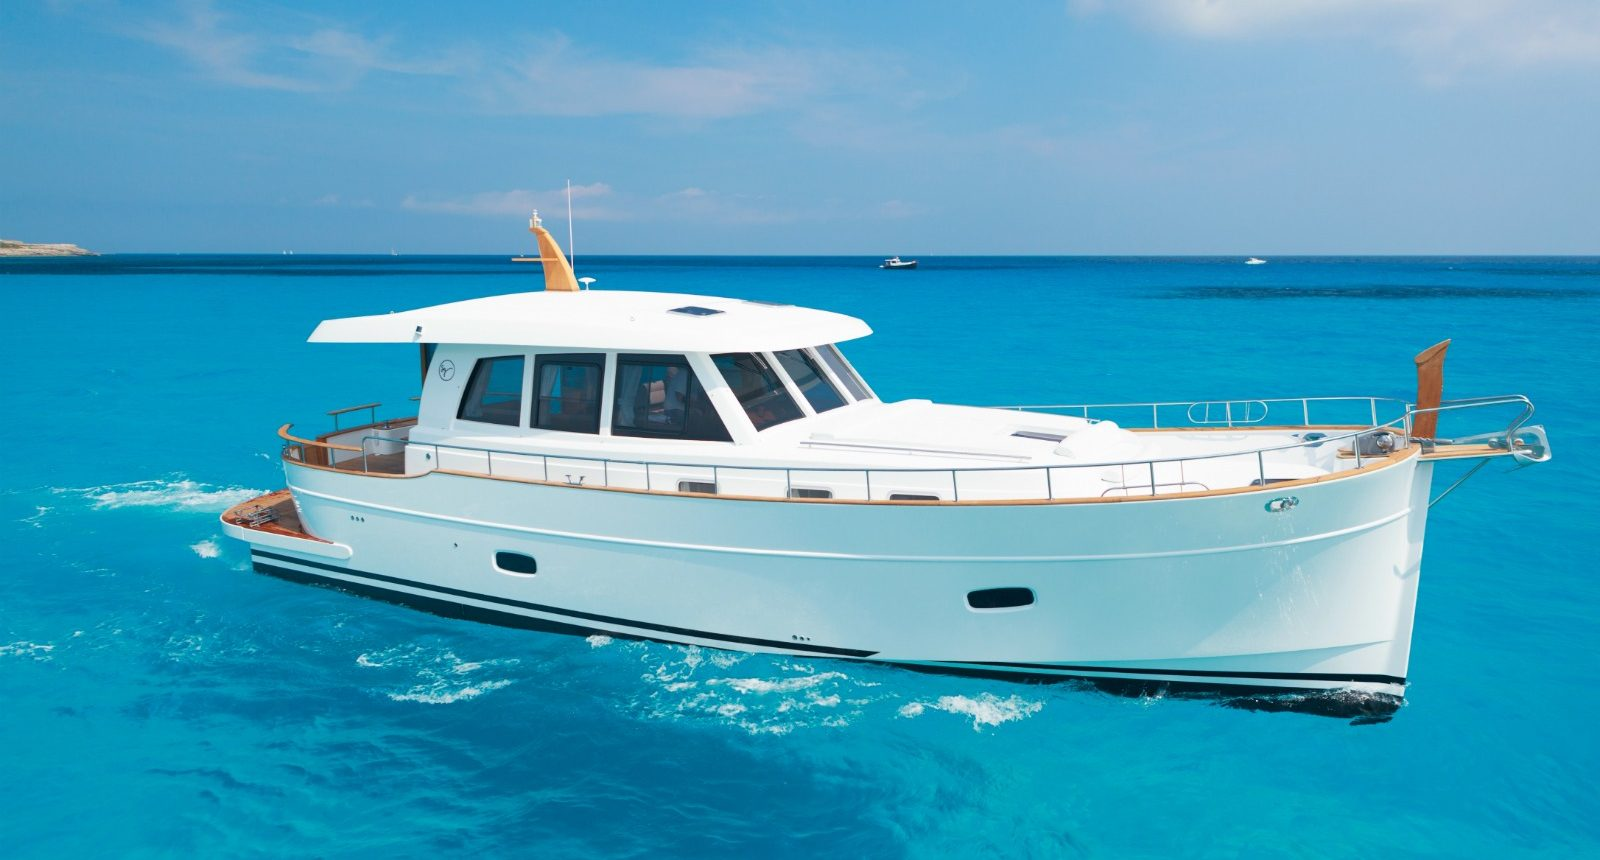 Minorca Islander 54 yacht for sale